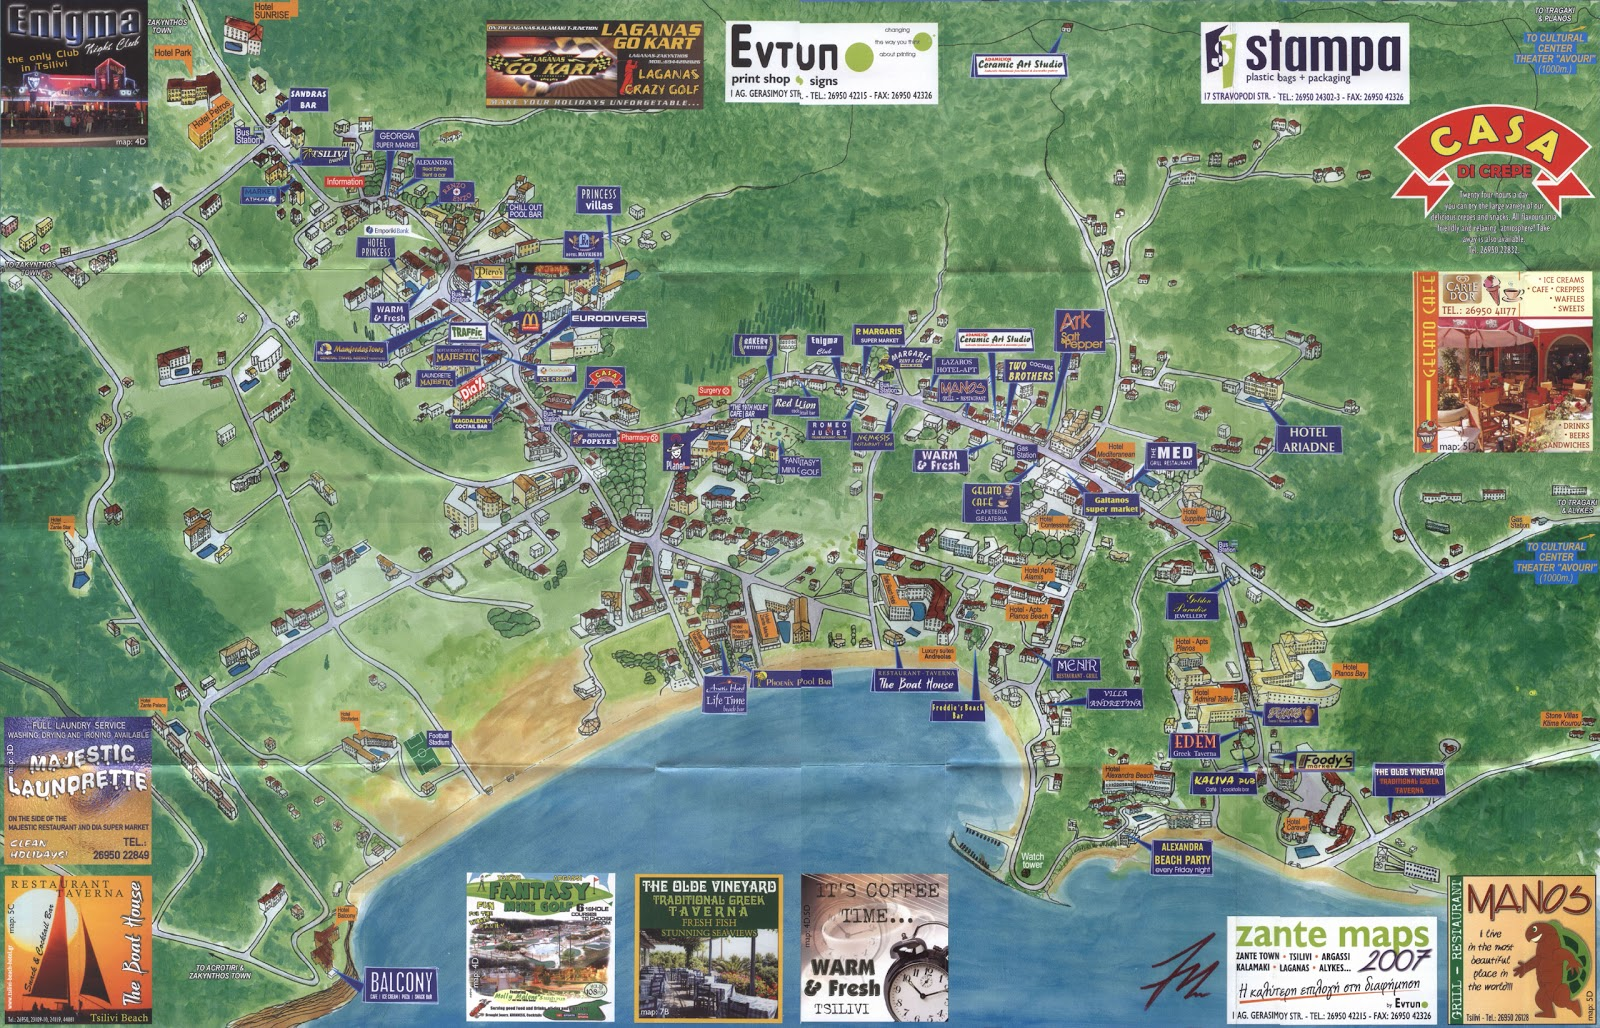 Zakynthos Travel Guide Holiday Guide to Tsilivi